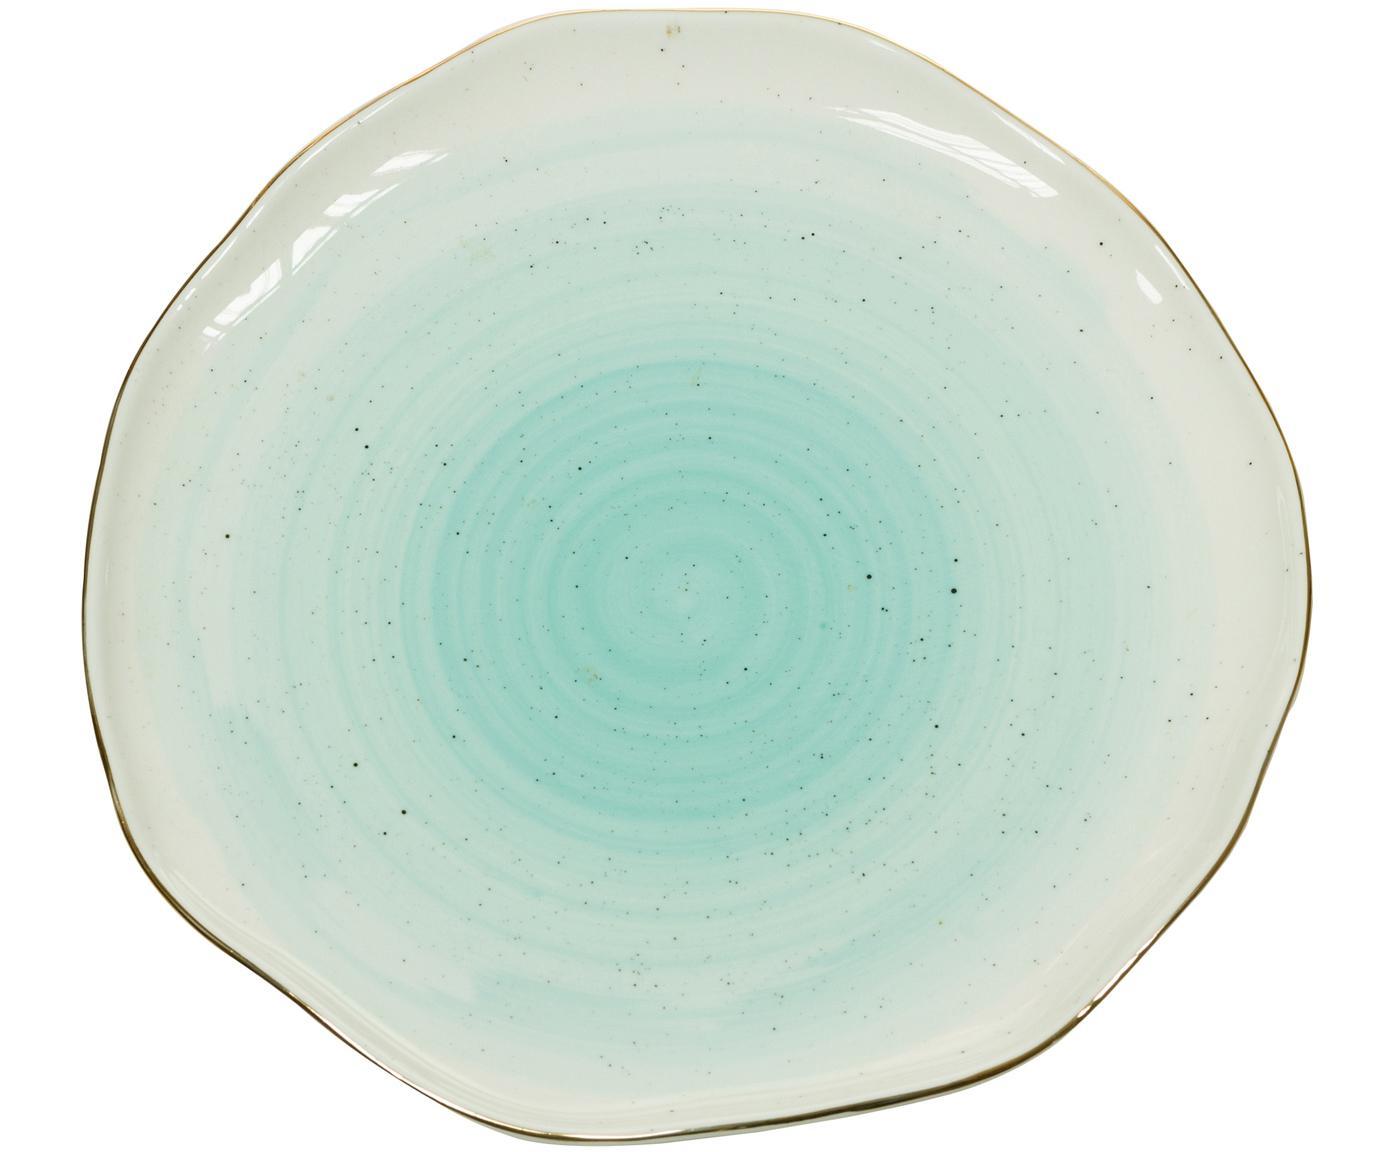 Handgemachte Frühstücksteller Bol mit Goldrand, 2 Stück, Porzellan, Türkisblau, Ø 19 x H 3 cm